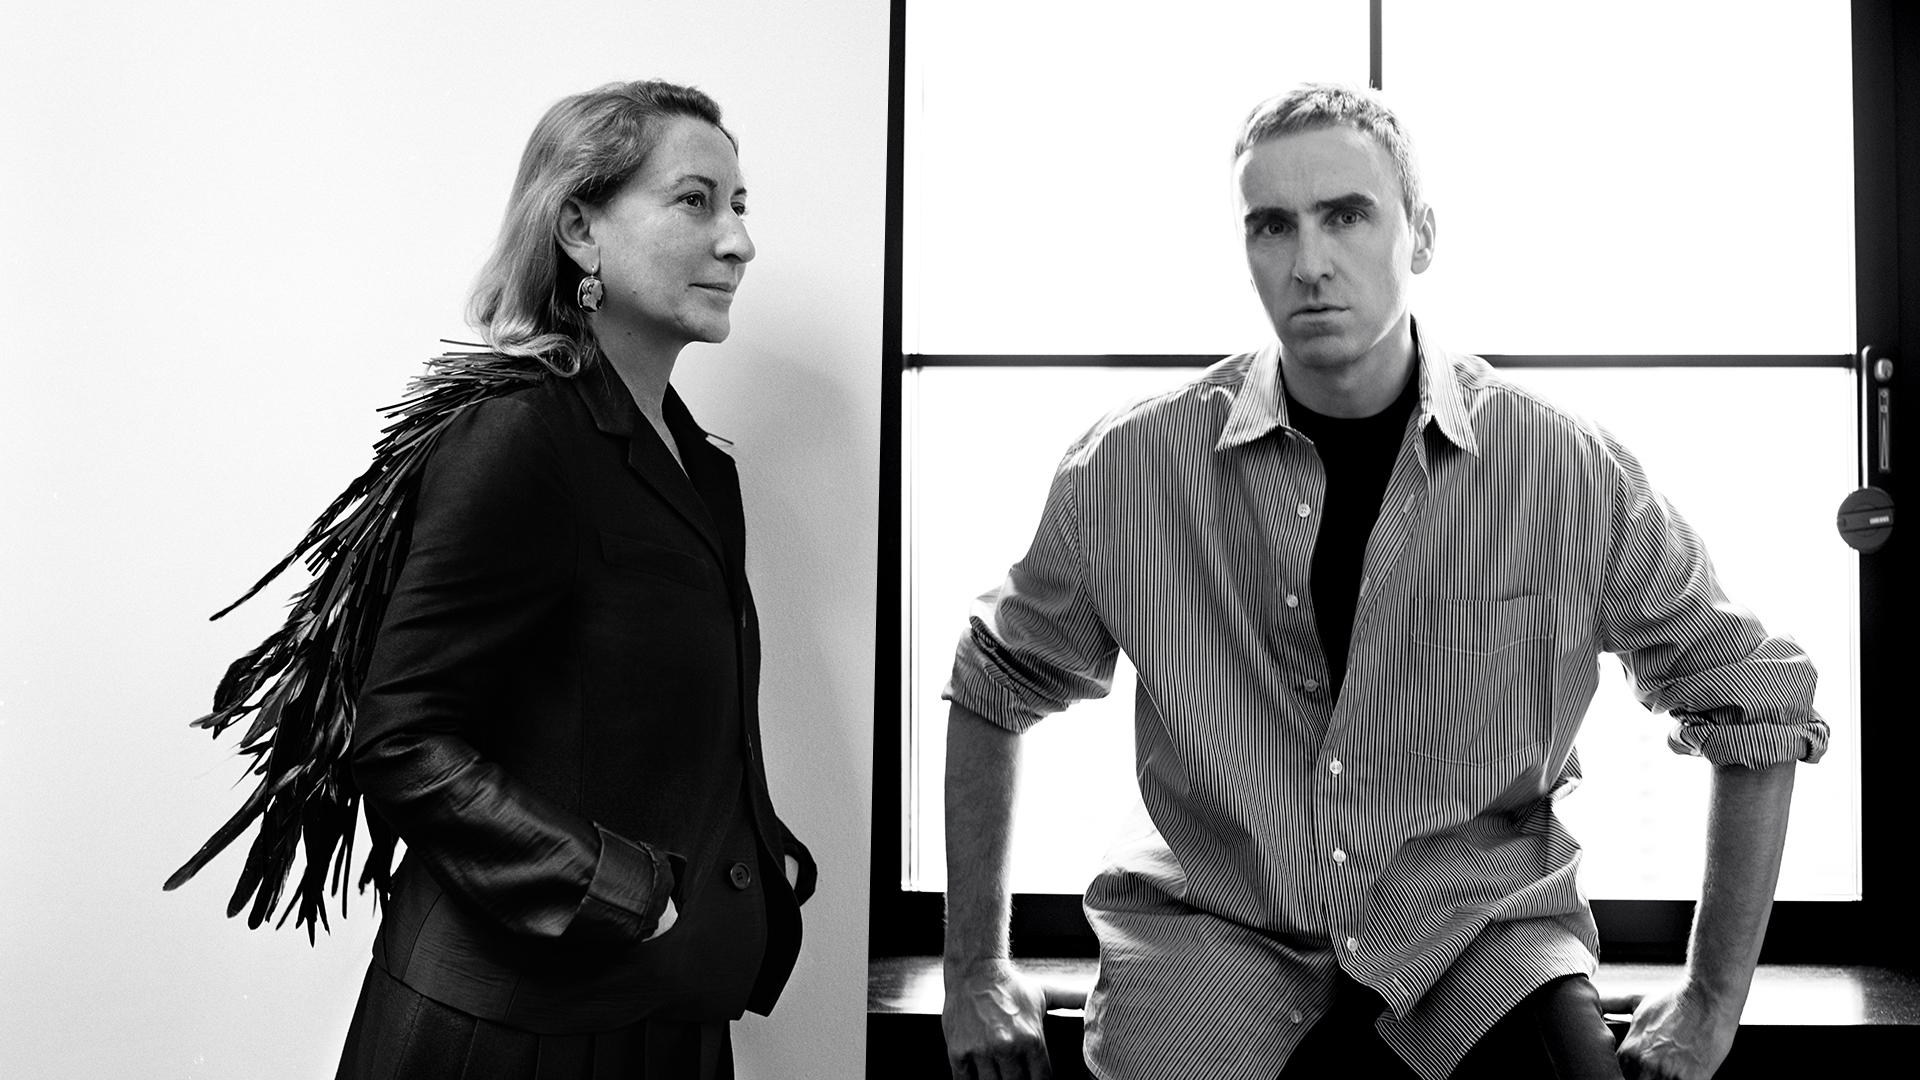 Raf Simons to be Prada's co-creative director